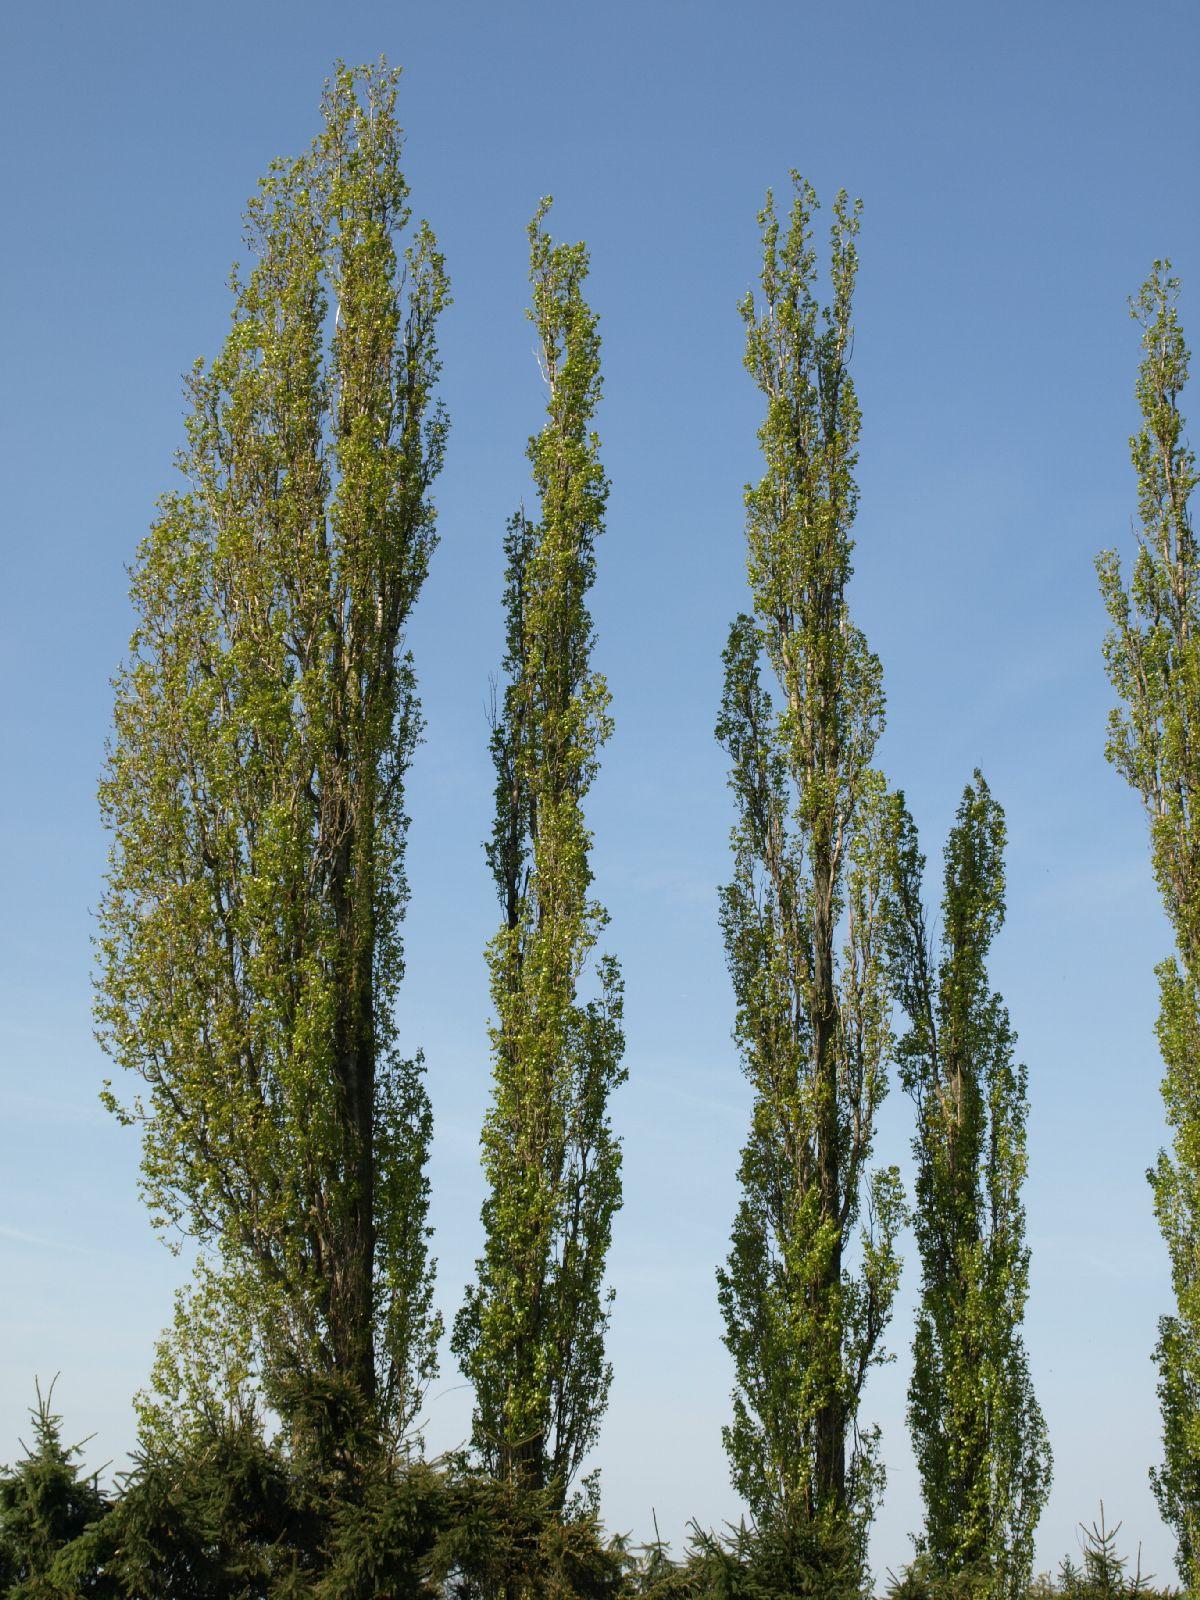 Plants-Trees_Photo_Texture_B_P5042417